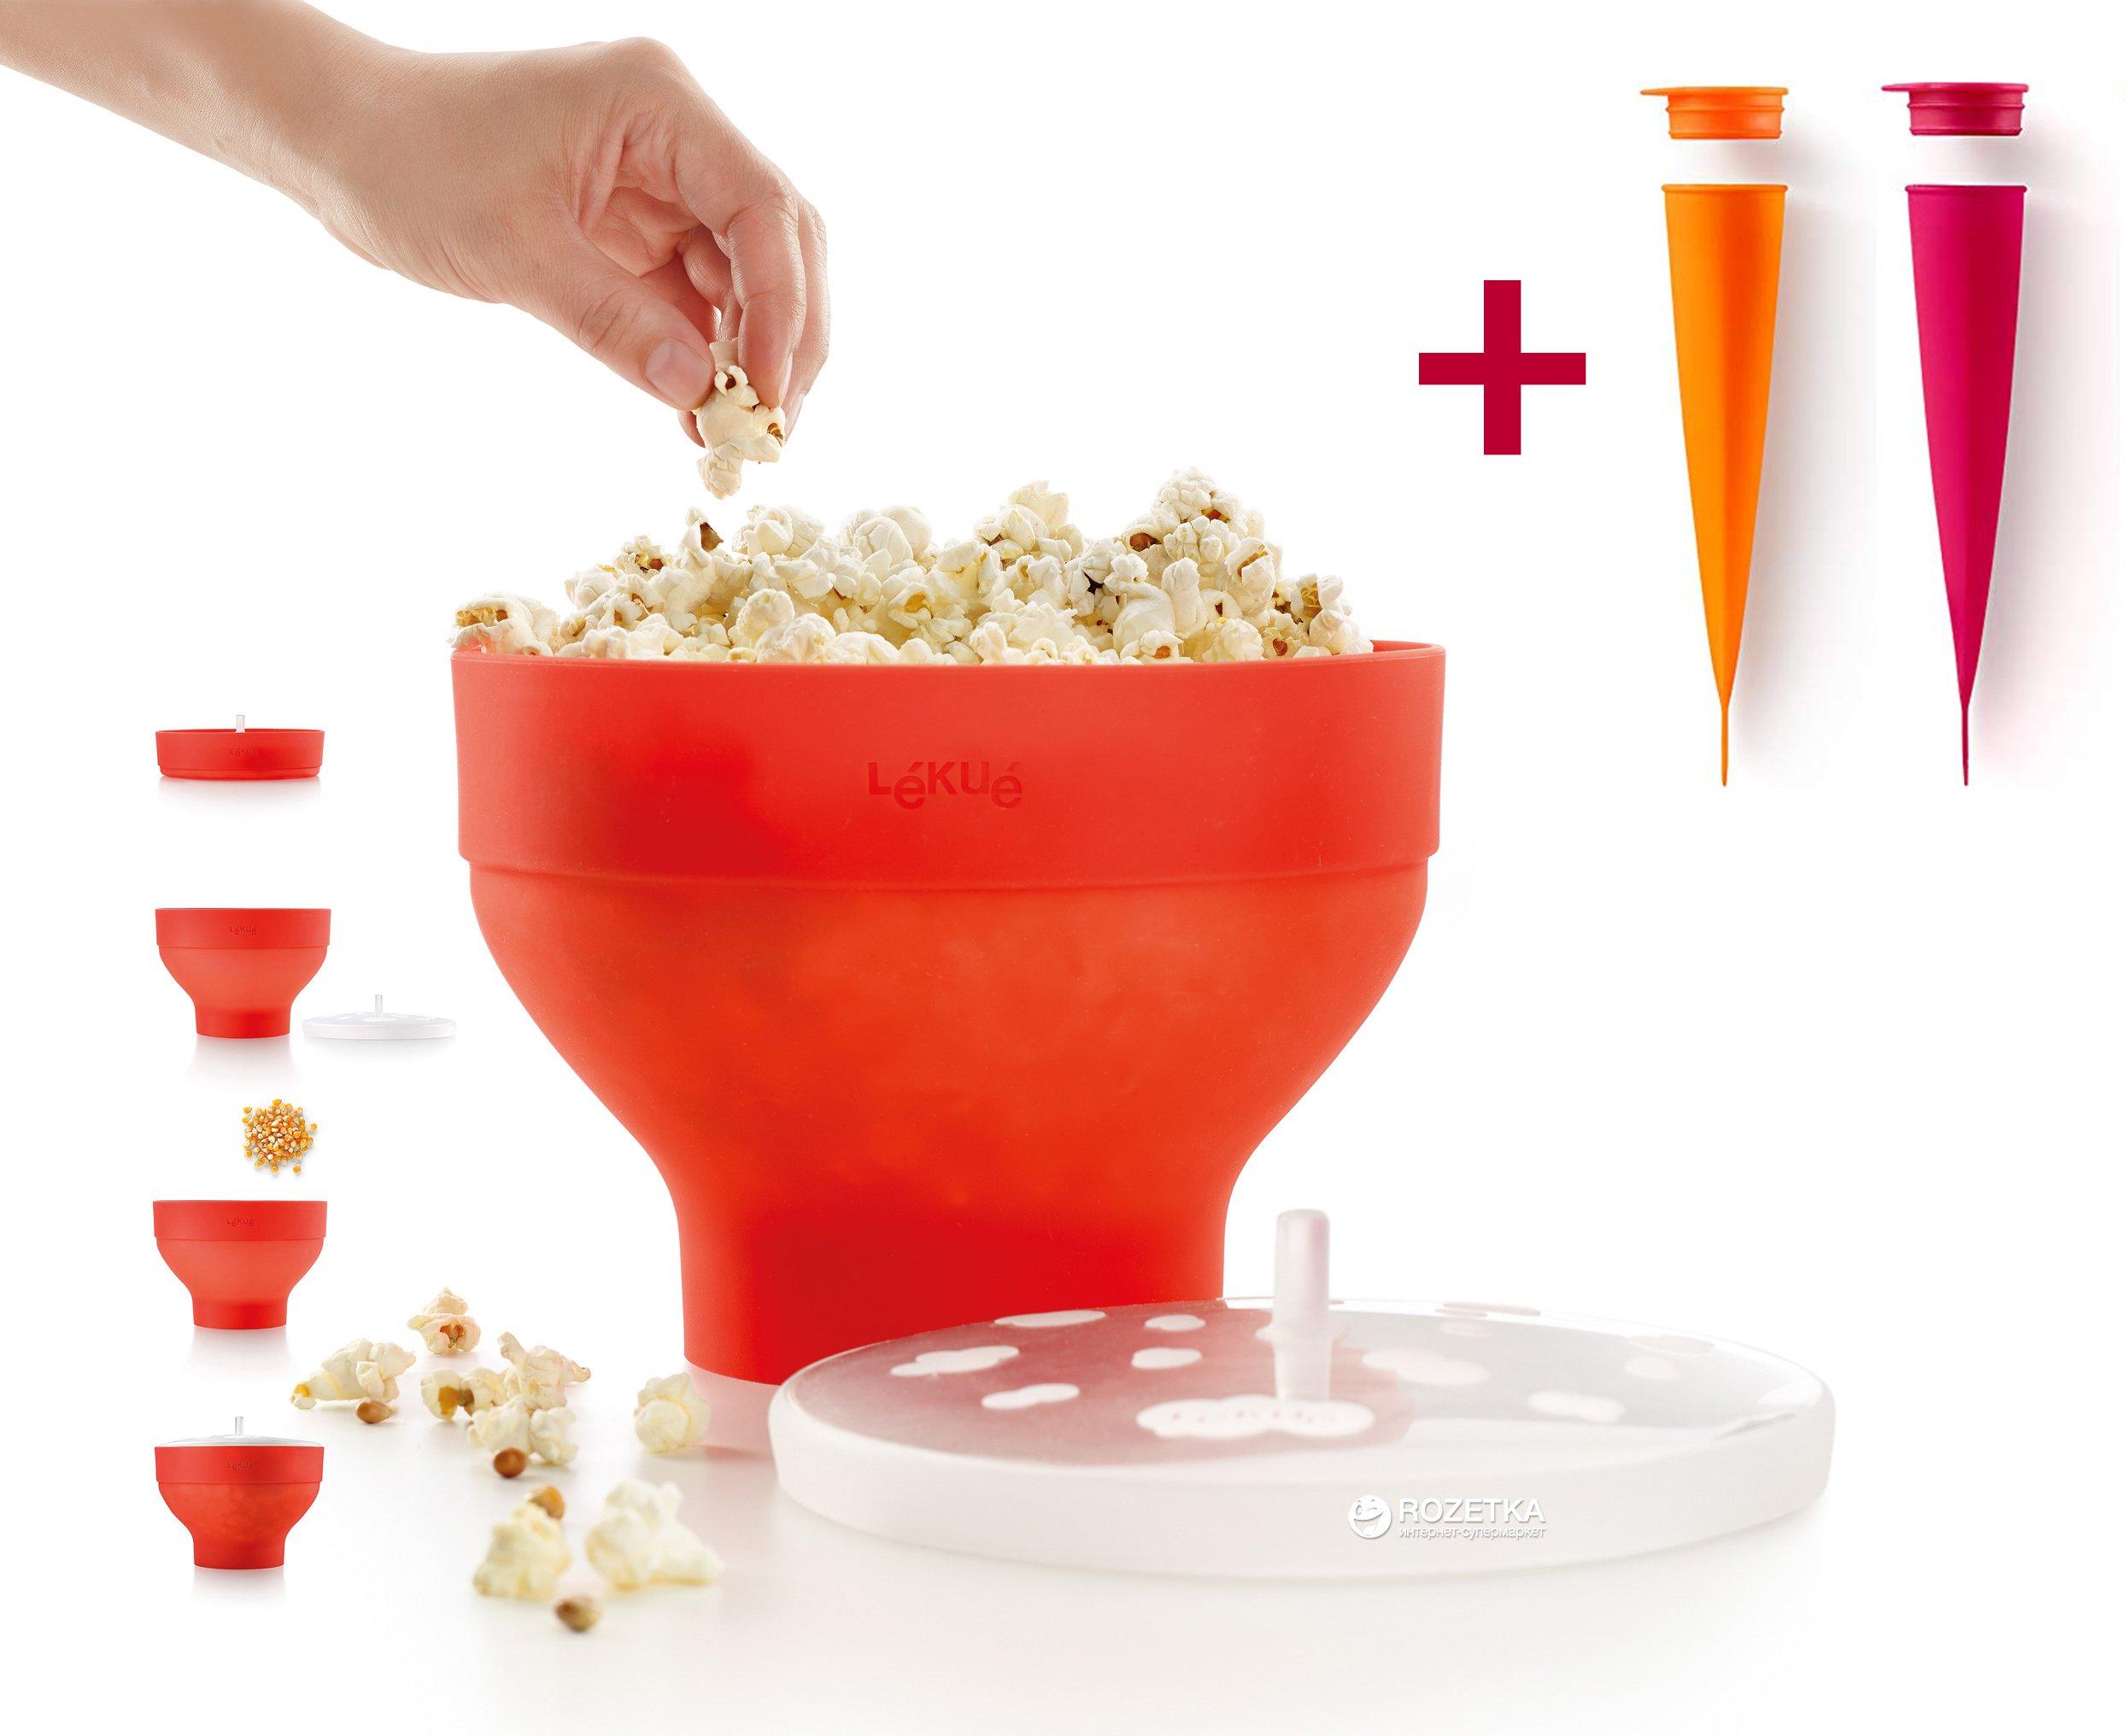 Набор Lekue:Форма для ПОПКОРНА  (цвет:красный ) +форма  для мороженого (цвет: оранж,маджента)